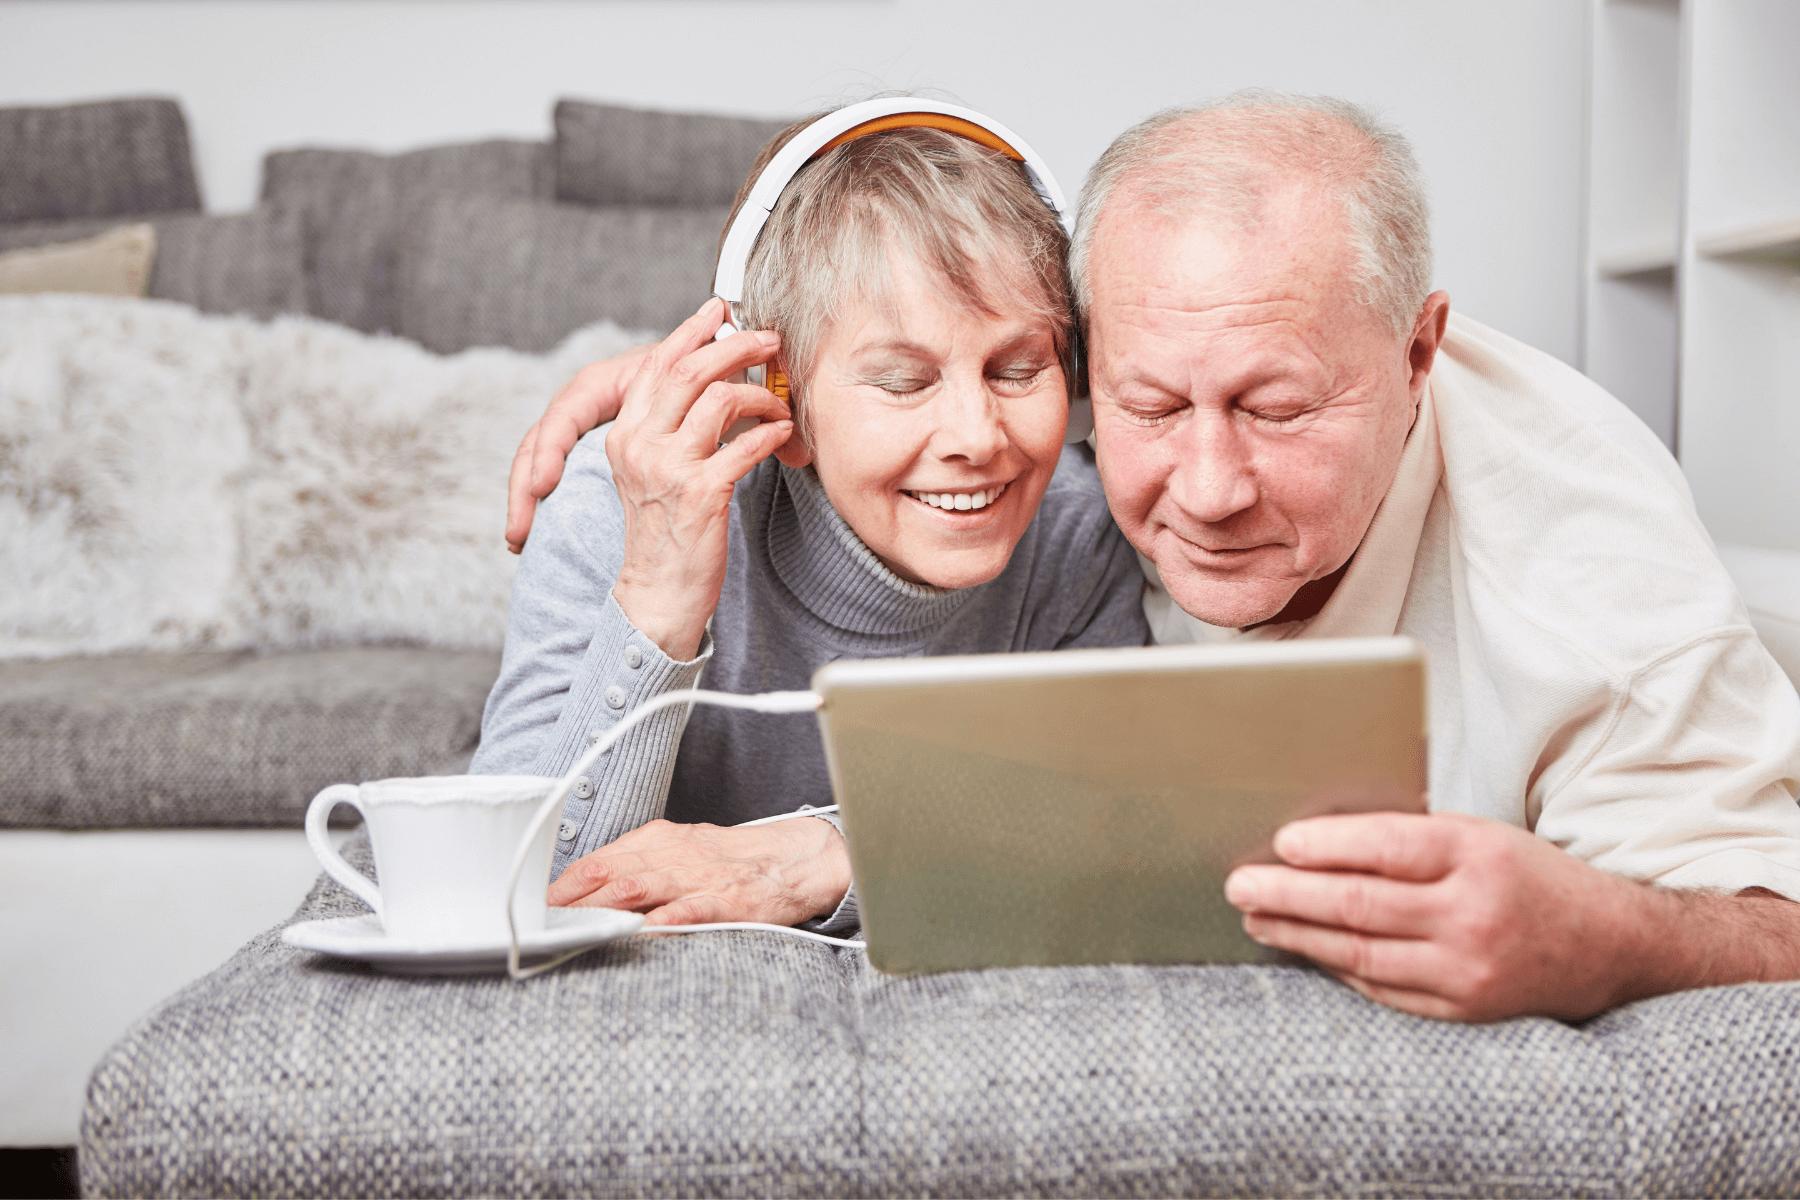 6 Benefits of Active Music Listening